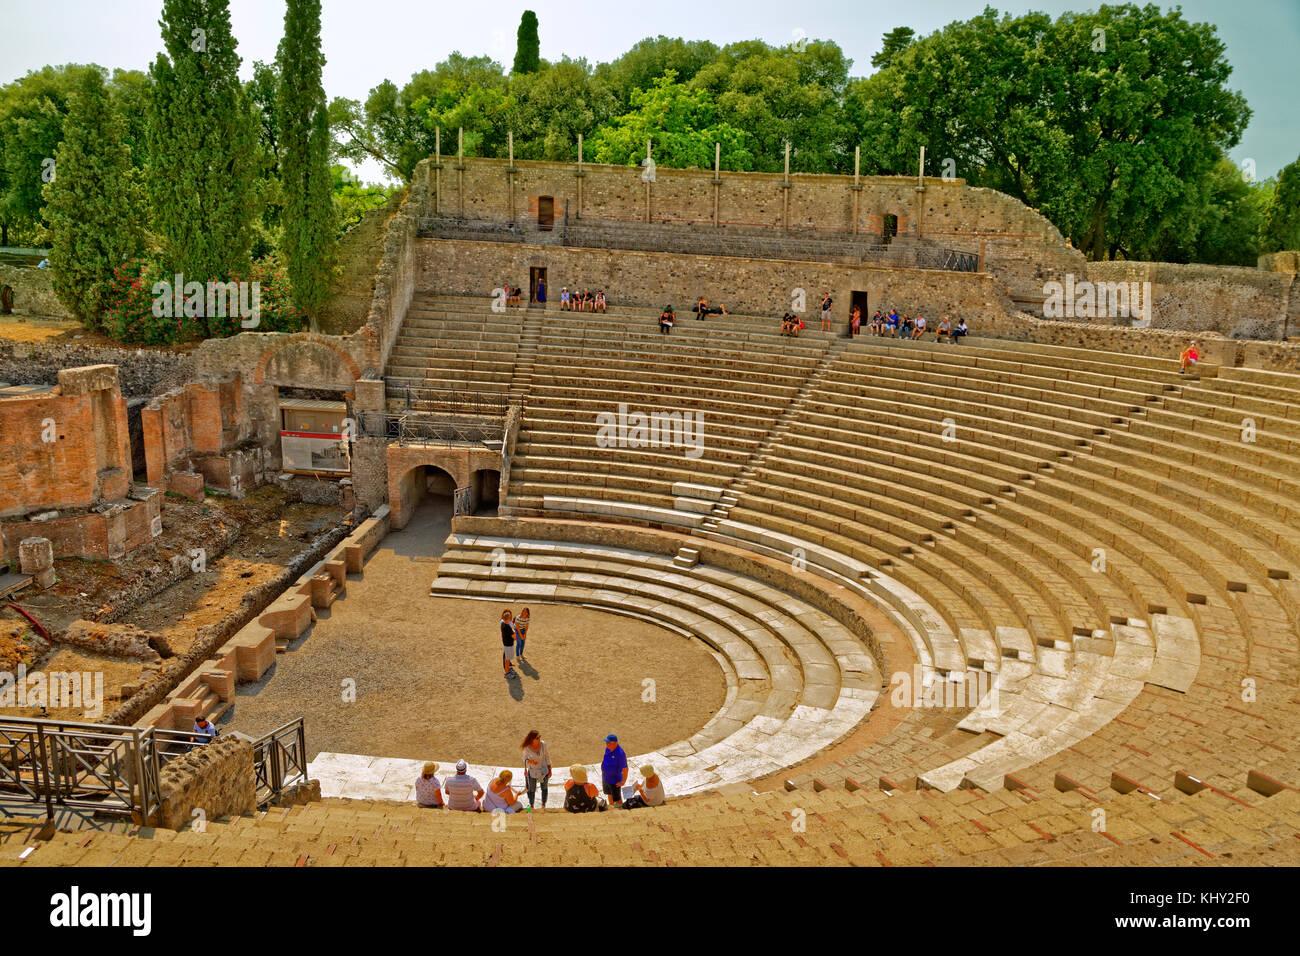 Grand theatre at the ruined Roman city of Pompeii at Pompei Scavi, near Naples, Italy. - Stock Image